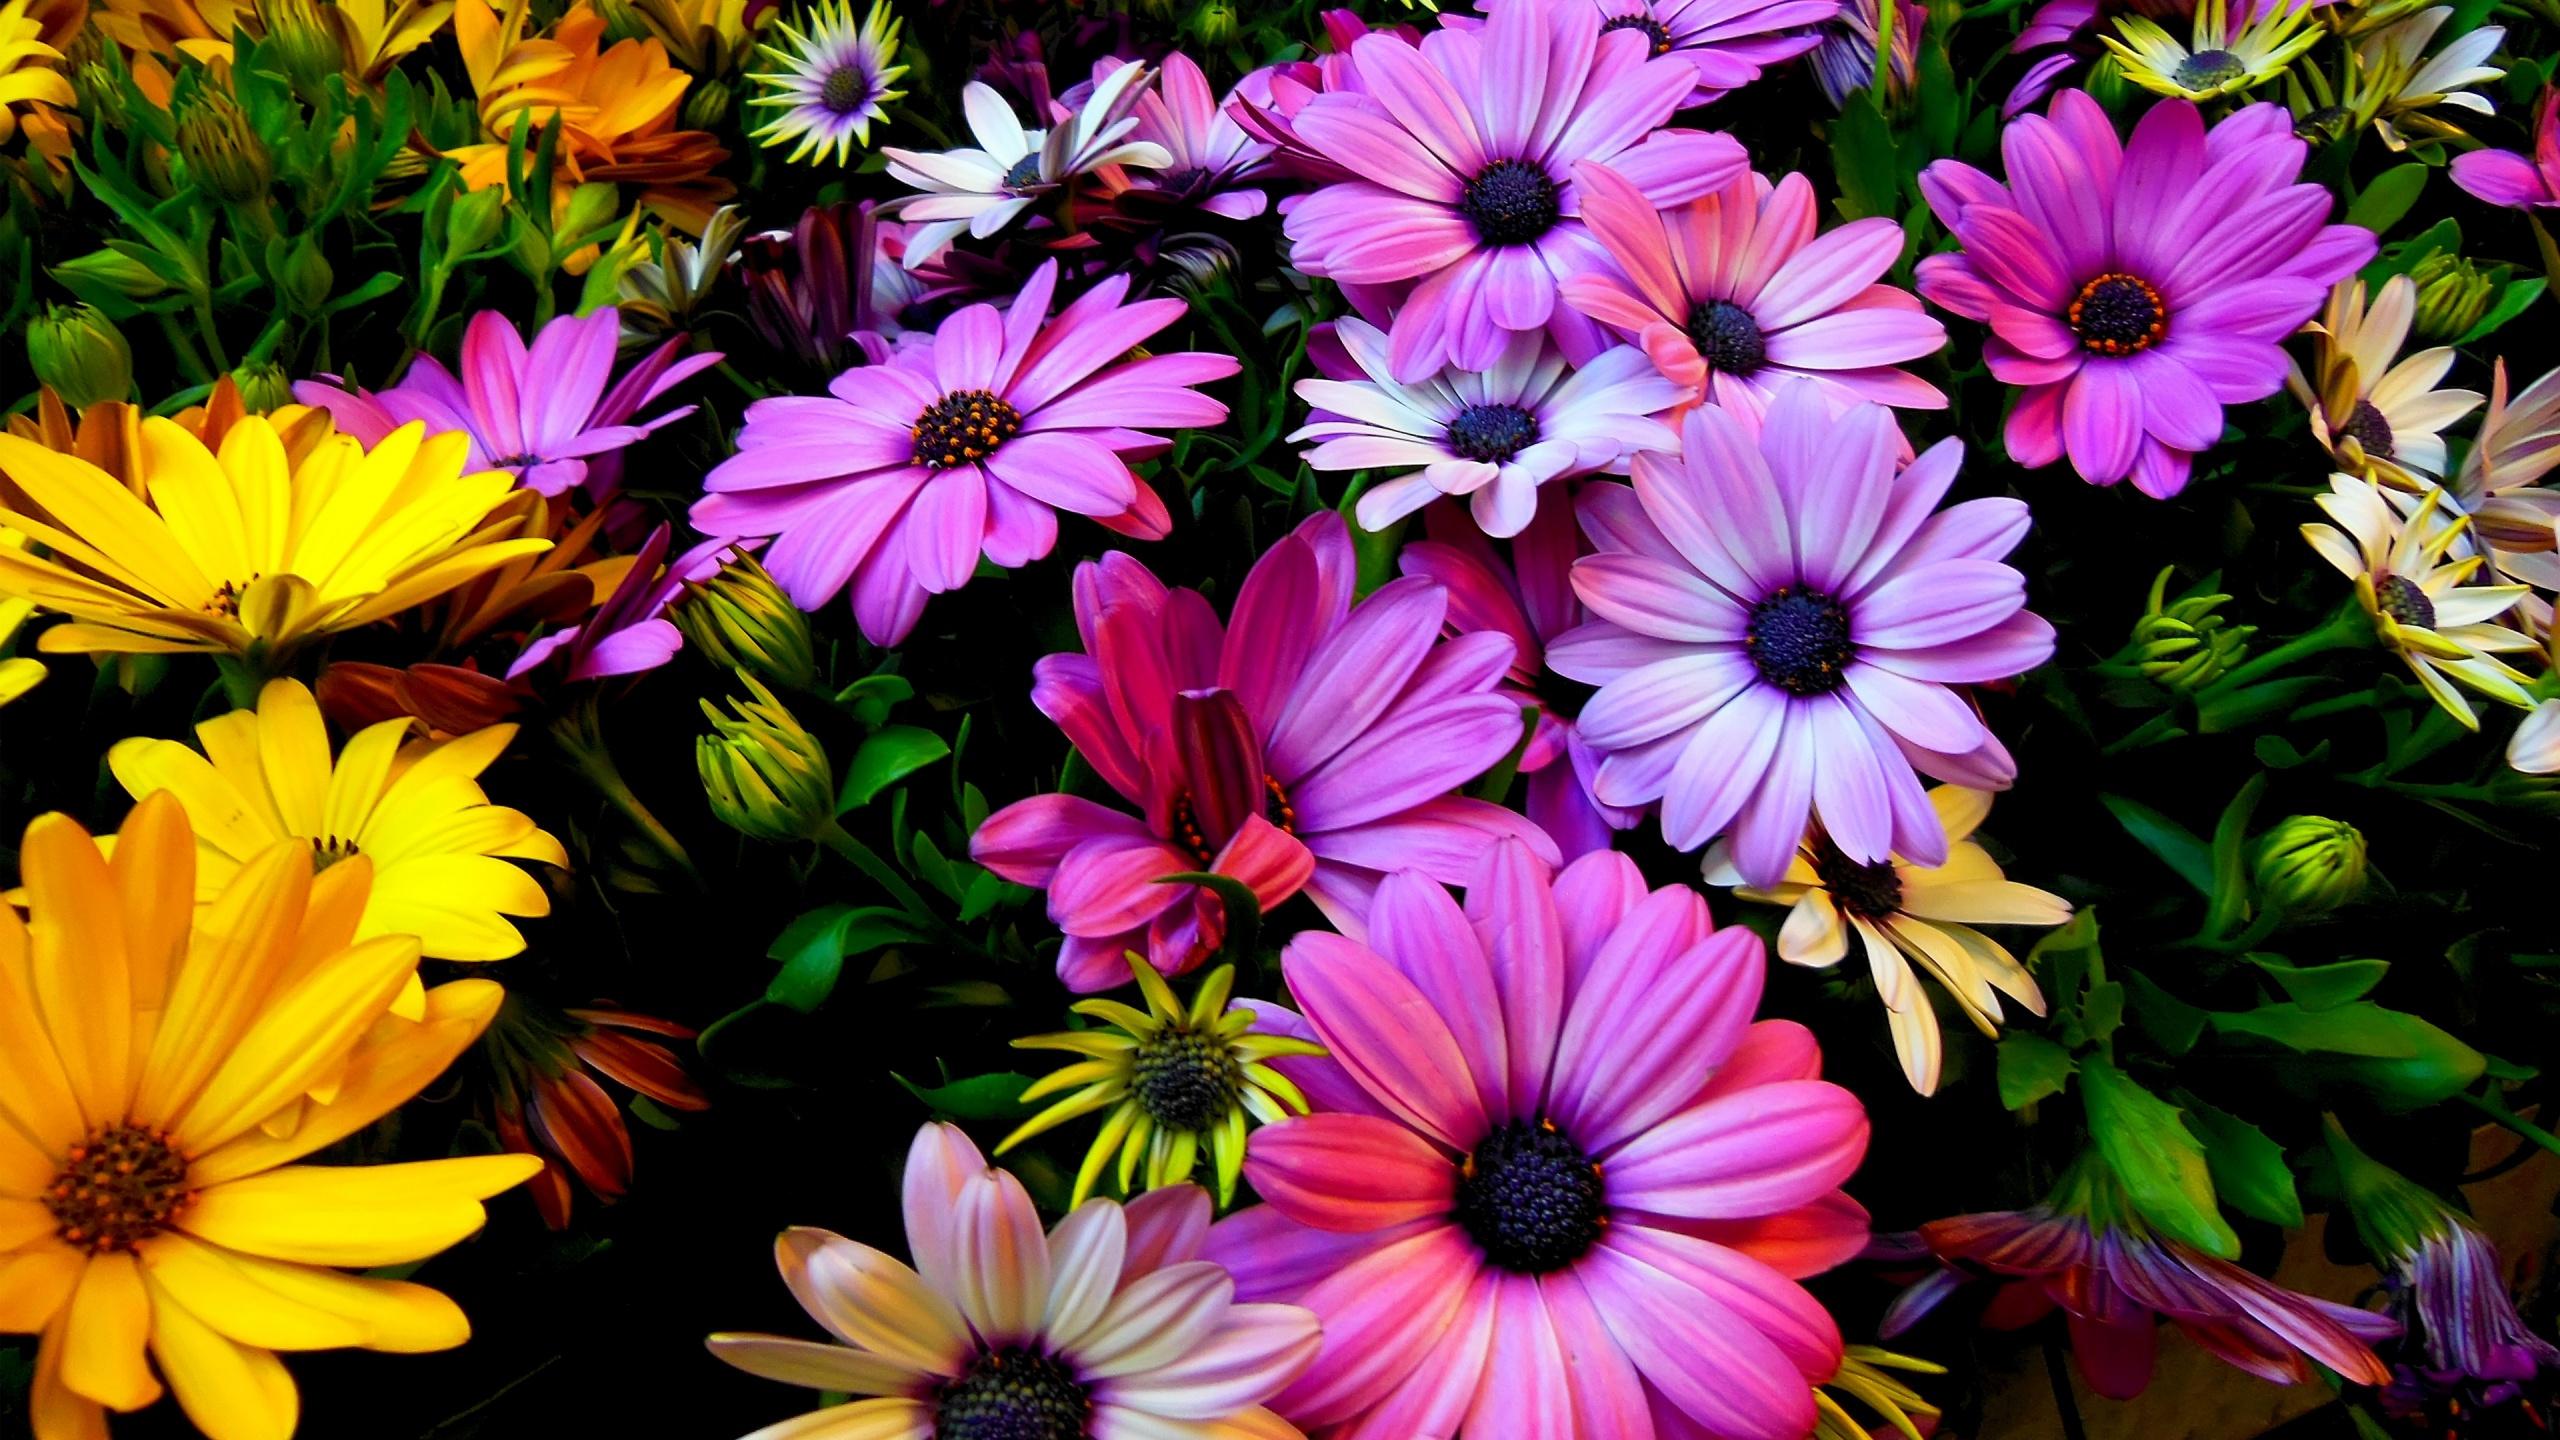 Purple Yellow Daisy Flowers 2560x1440 - High Definition ...